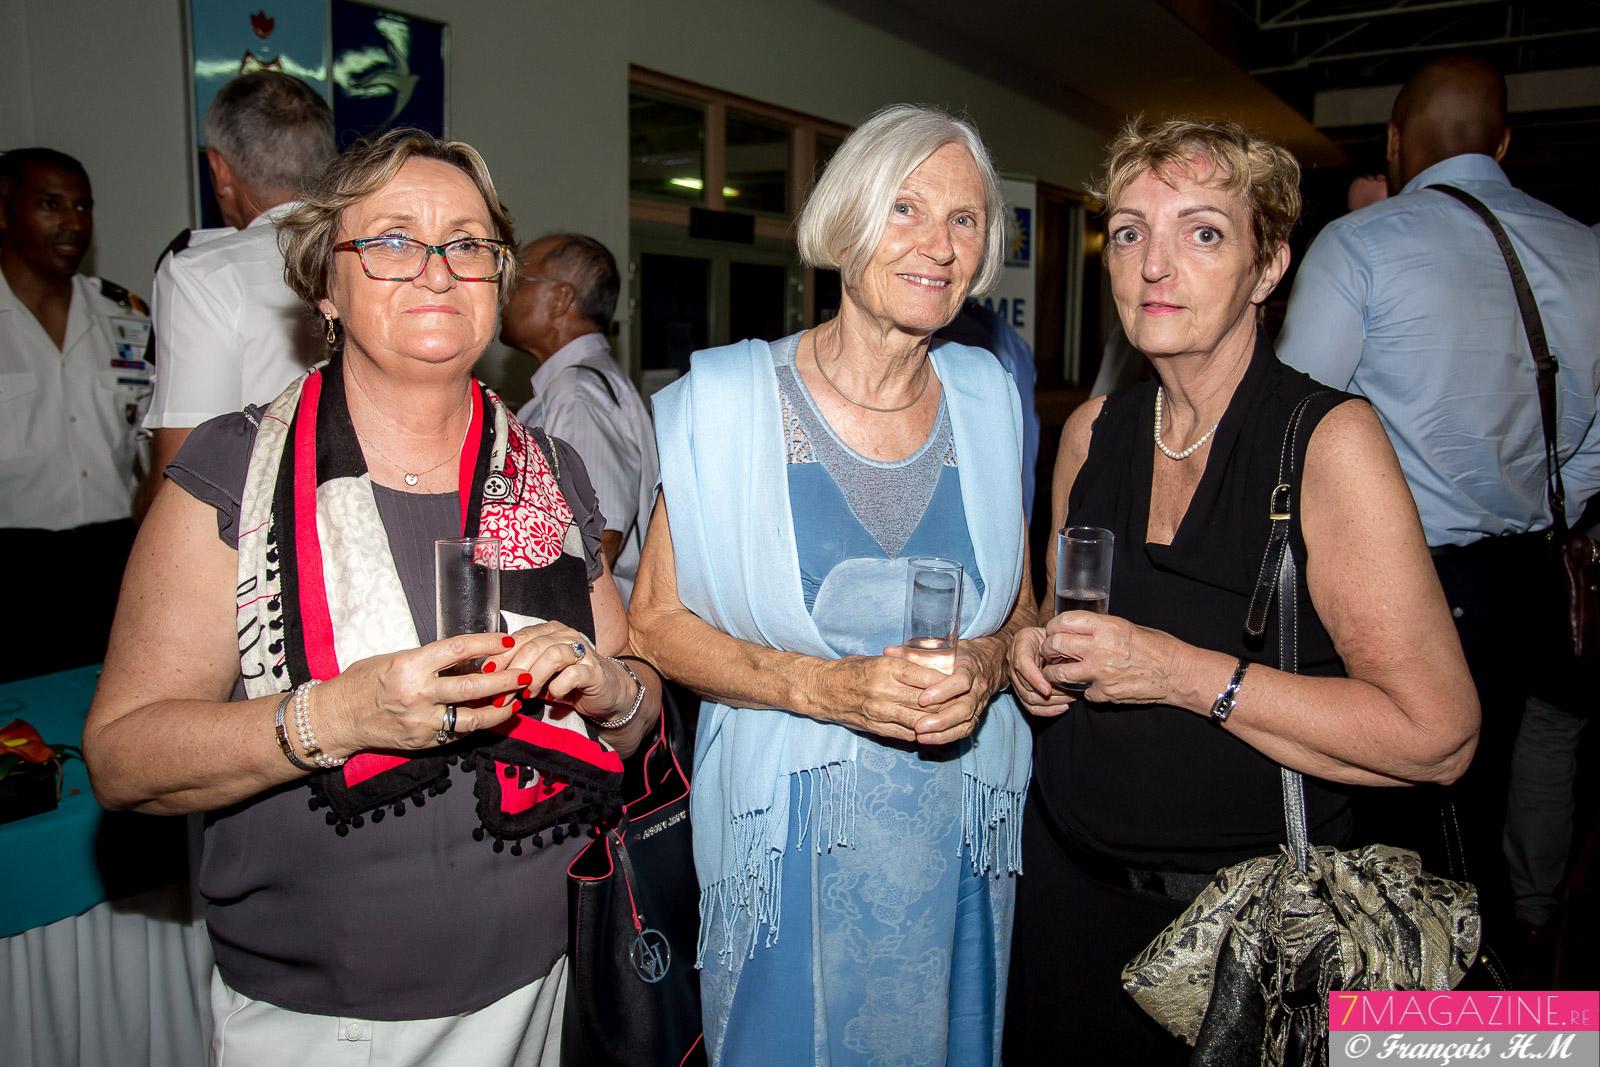 Elisabeth Martinazzo, Anne-Marie Polenyck, et Martine Dubois